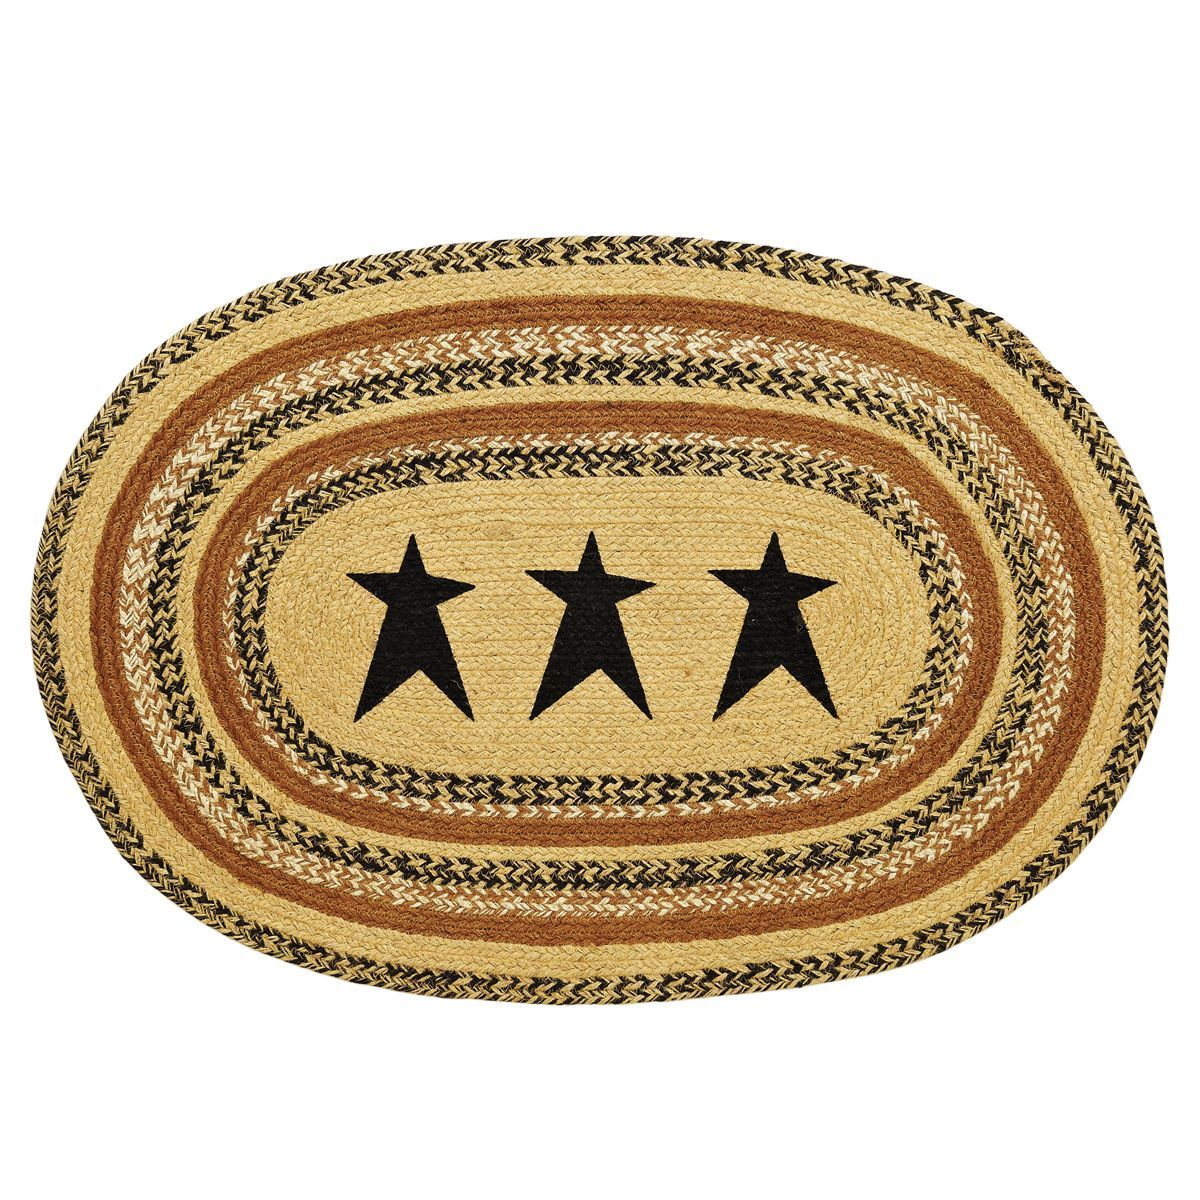 Kettle Grove - Stencil Black Stars - Braided Jute - Oval - 24 x 36 - Rug